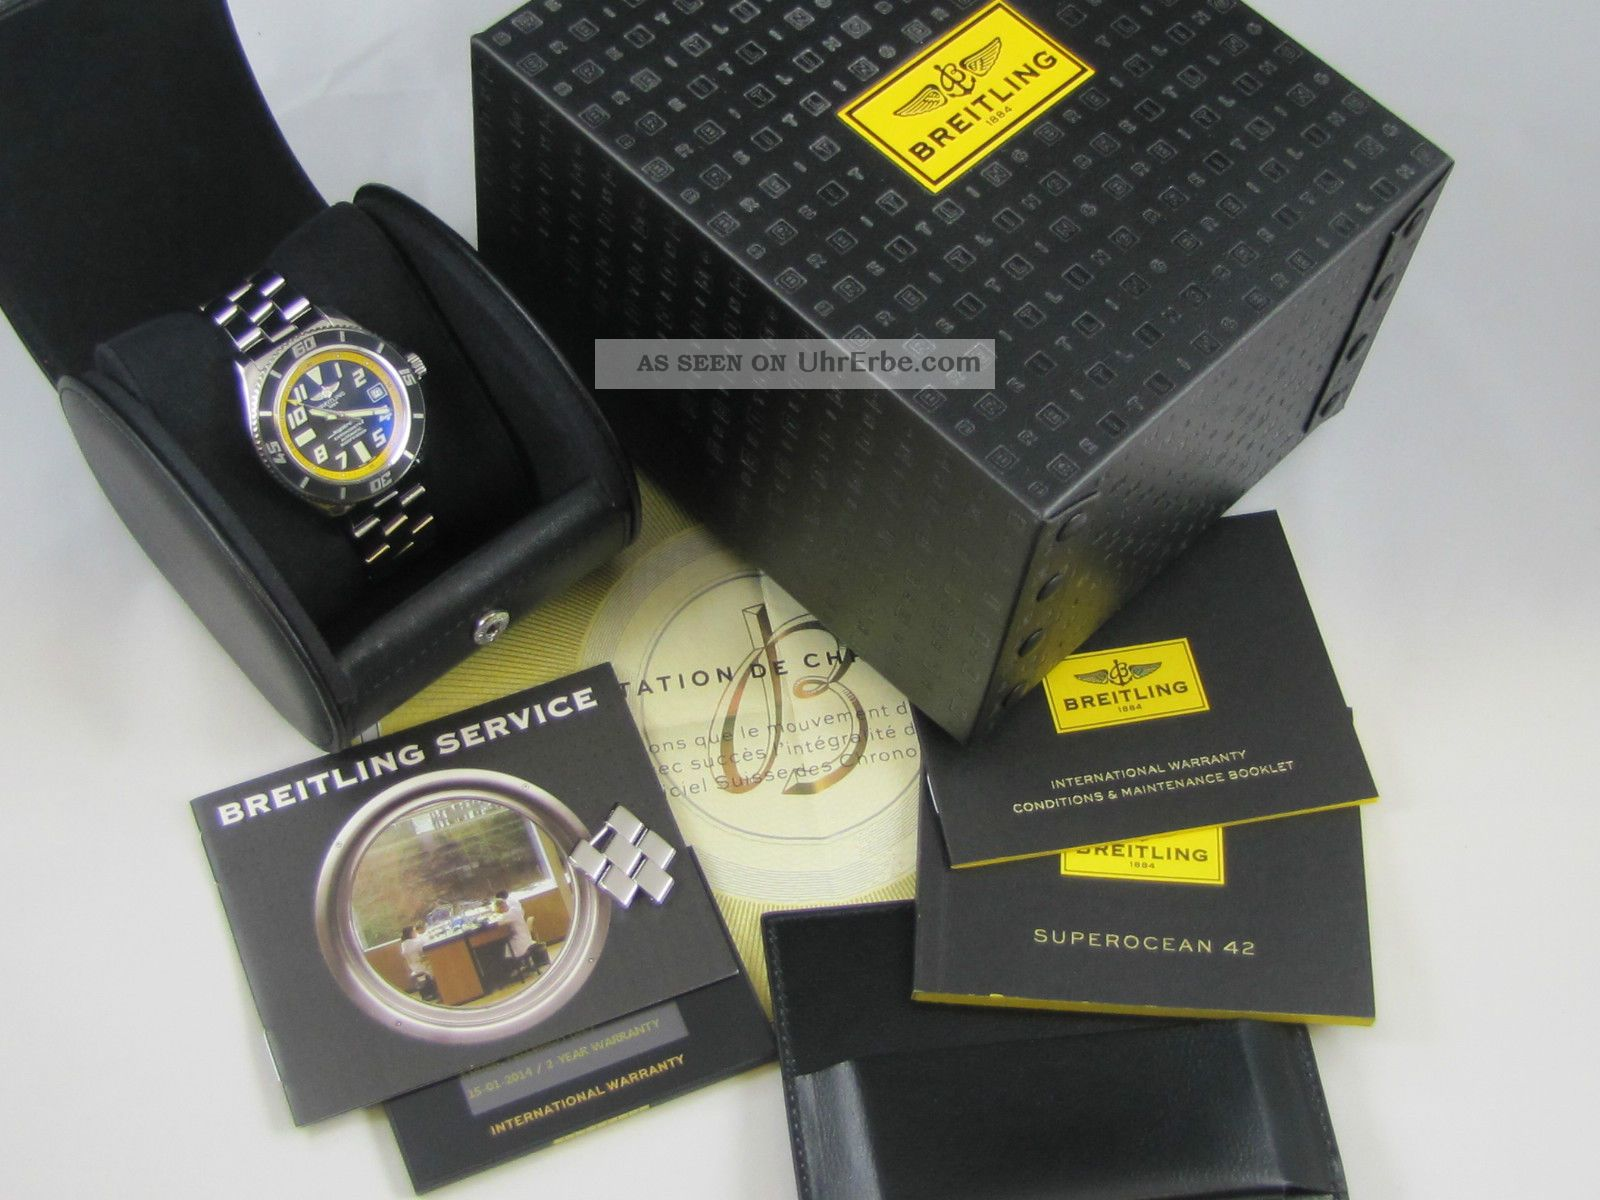 Breitling Superocean 42 (abyss Yellow) Fullset Box,  Papiere Armbanduhren Bild